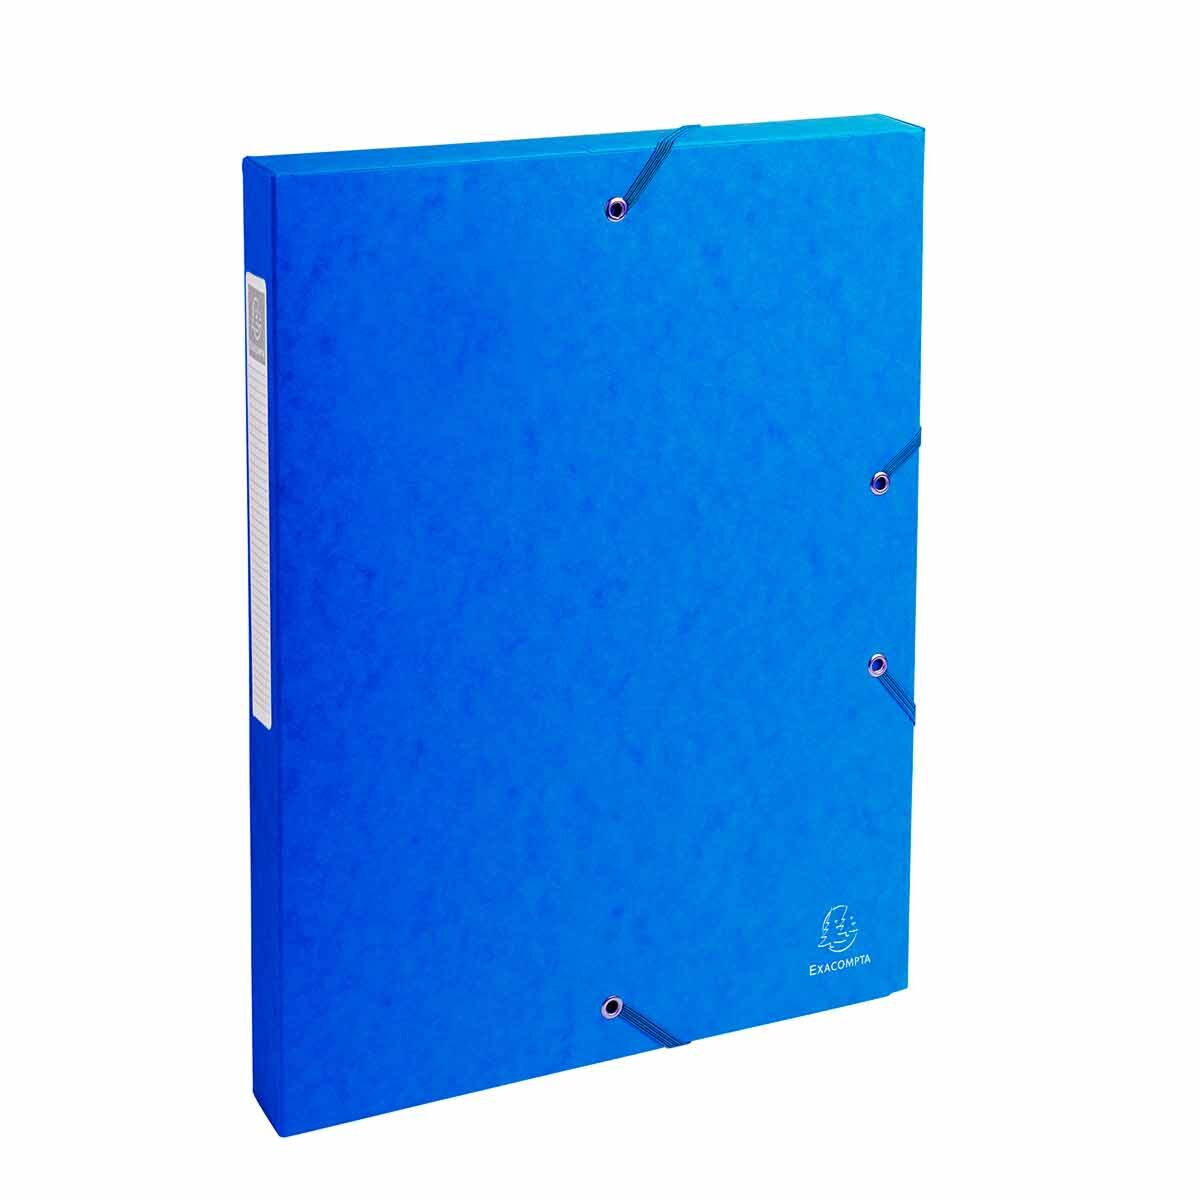 Exacompta Elasticated Box File Pressboard A4 25mm Pack of 8